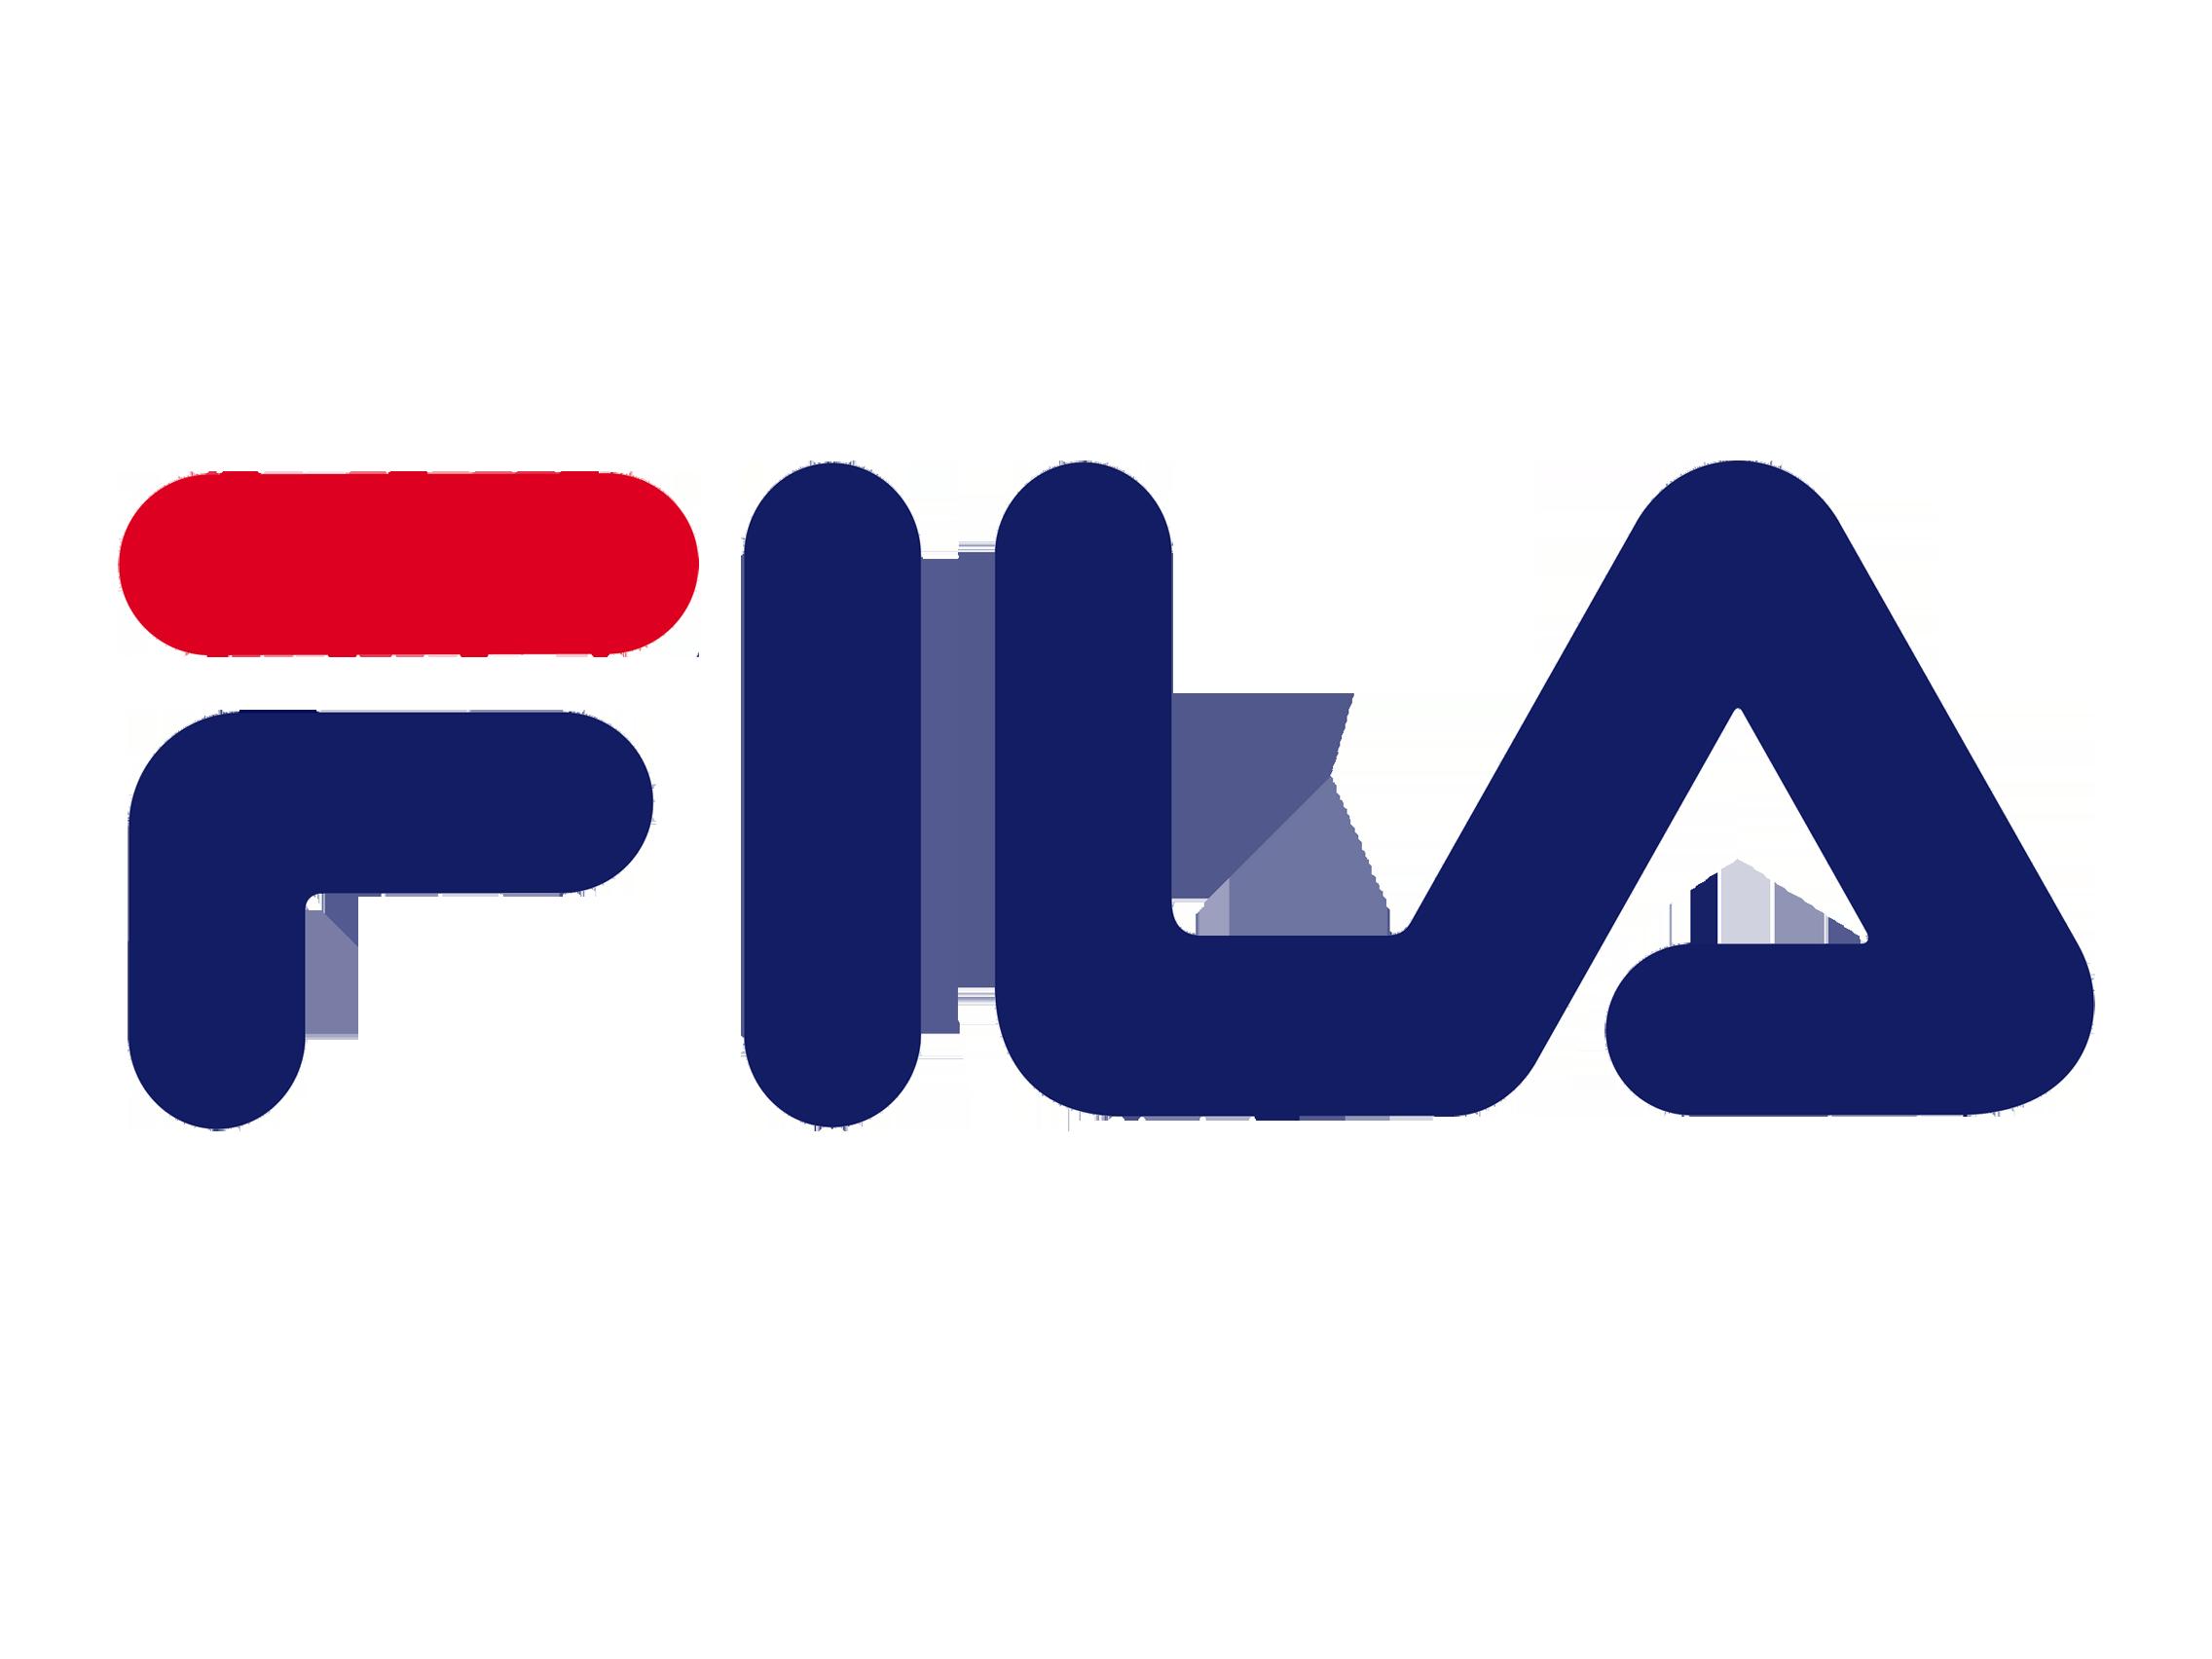 Fifa Logo Png 2272 1704 Logo Vetement Logo Marque Vetement Marque Vetement